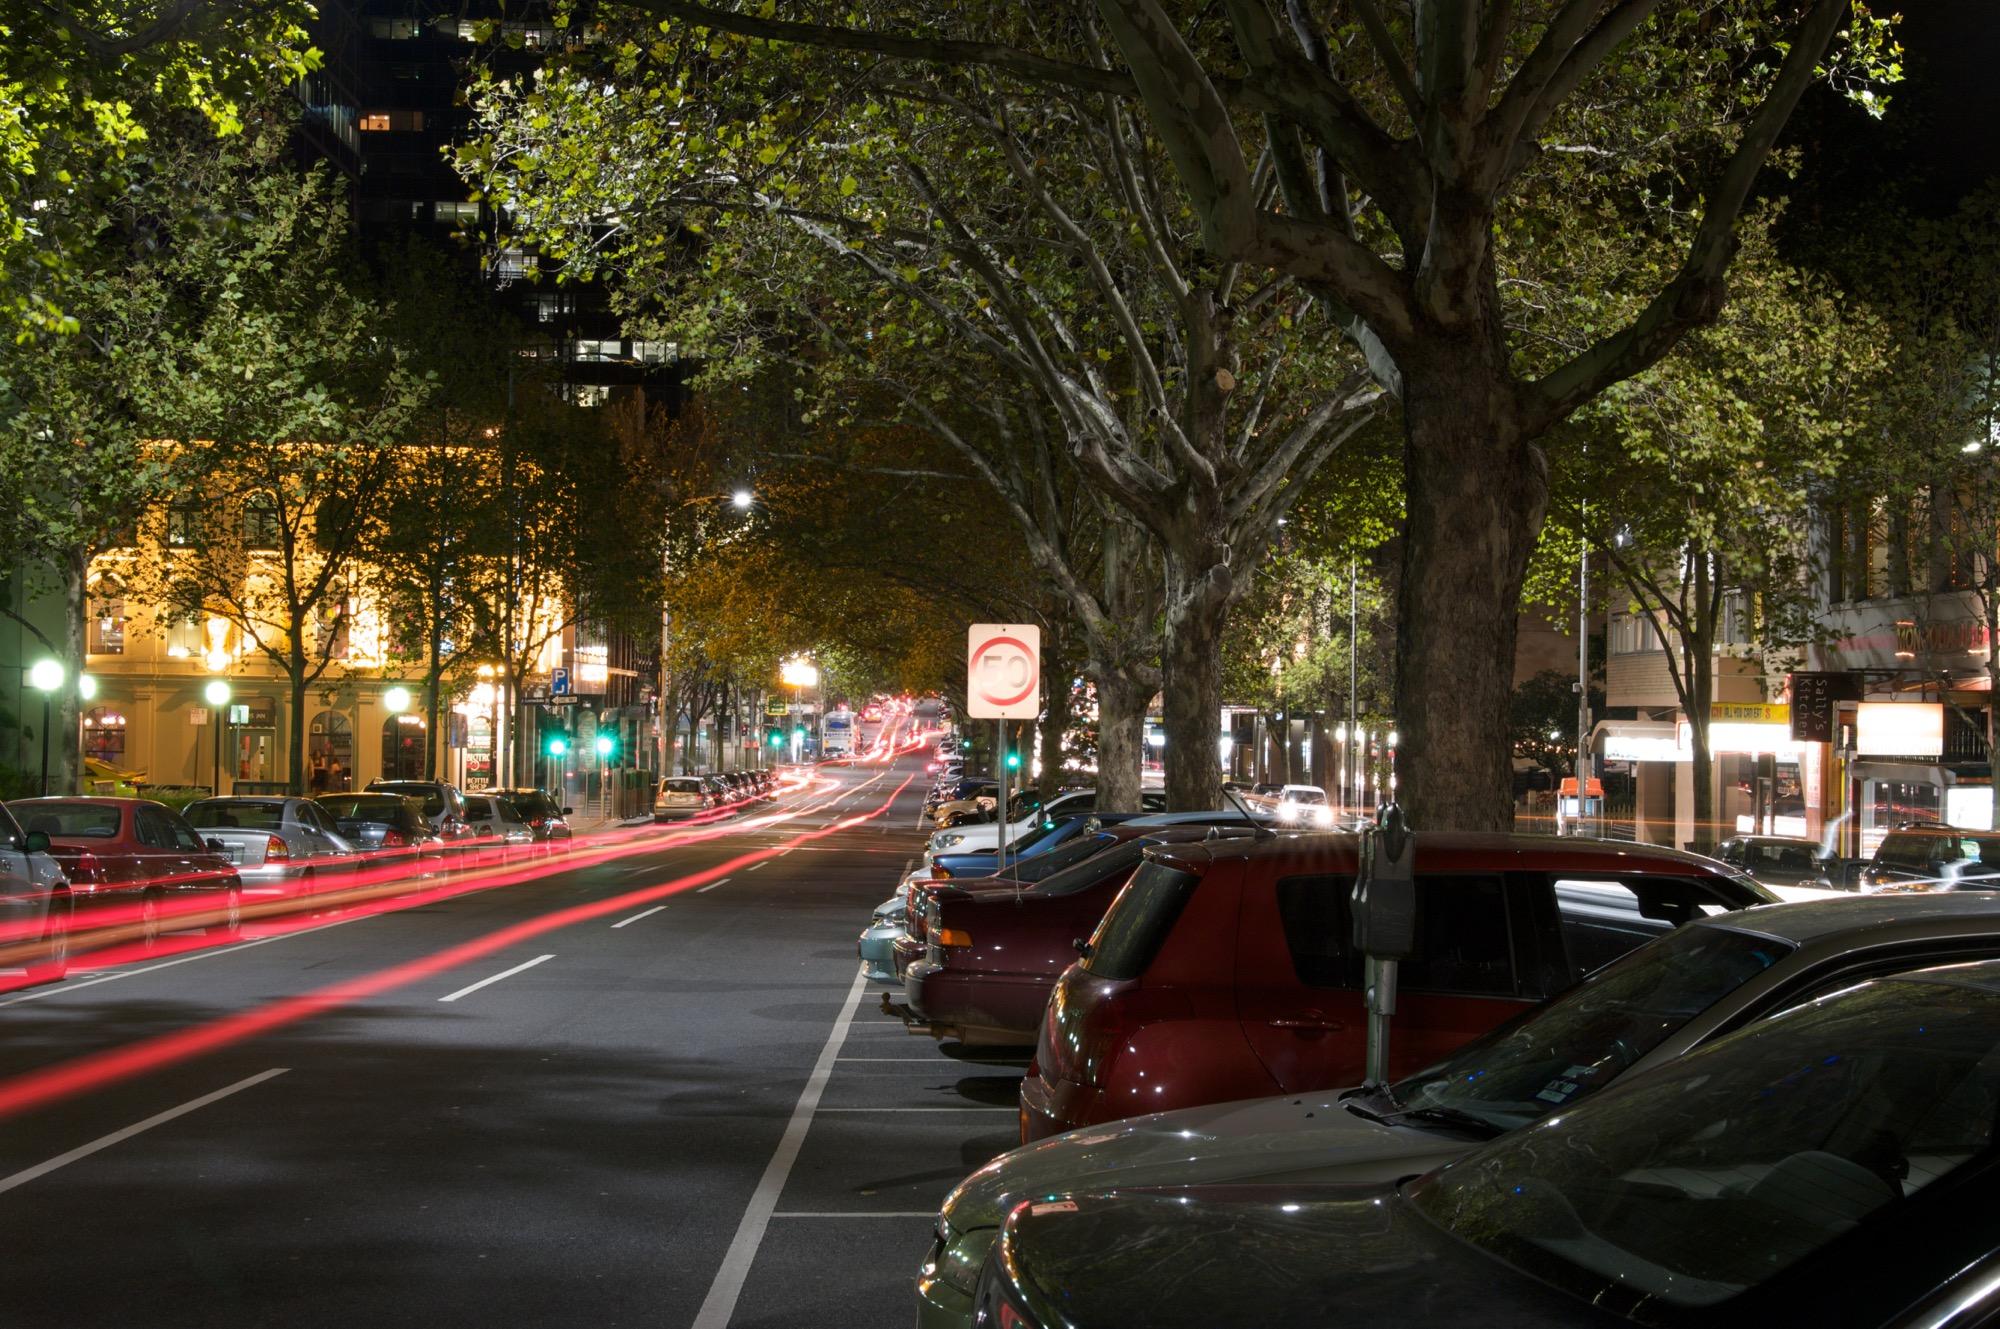 Melbourne stuff - 1 of 223 (137).jpg